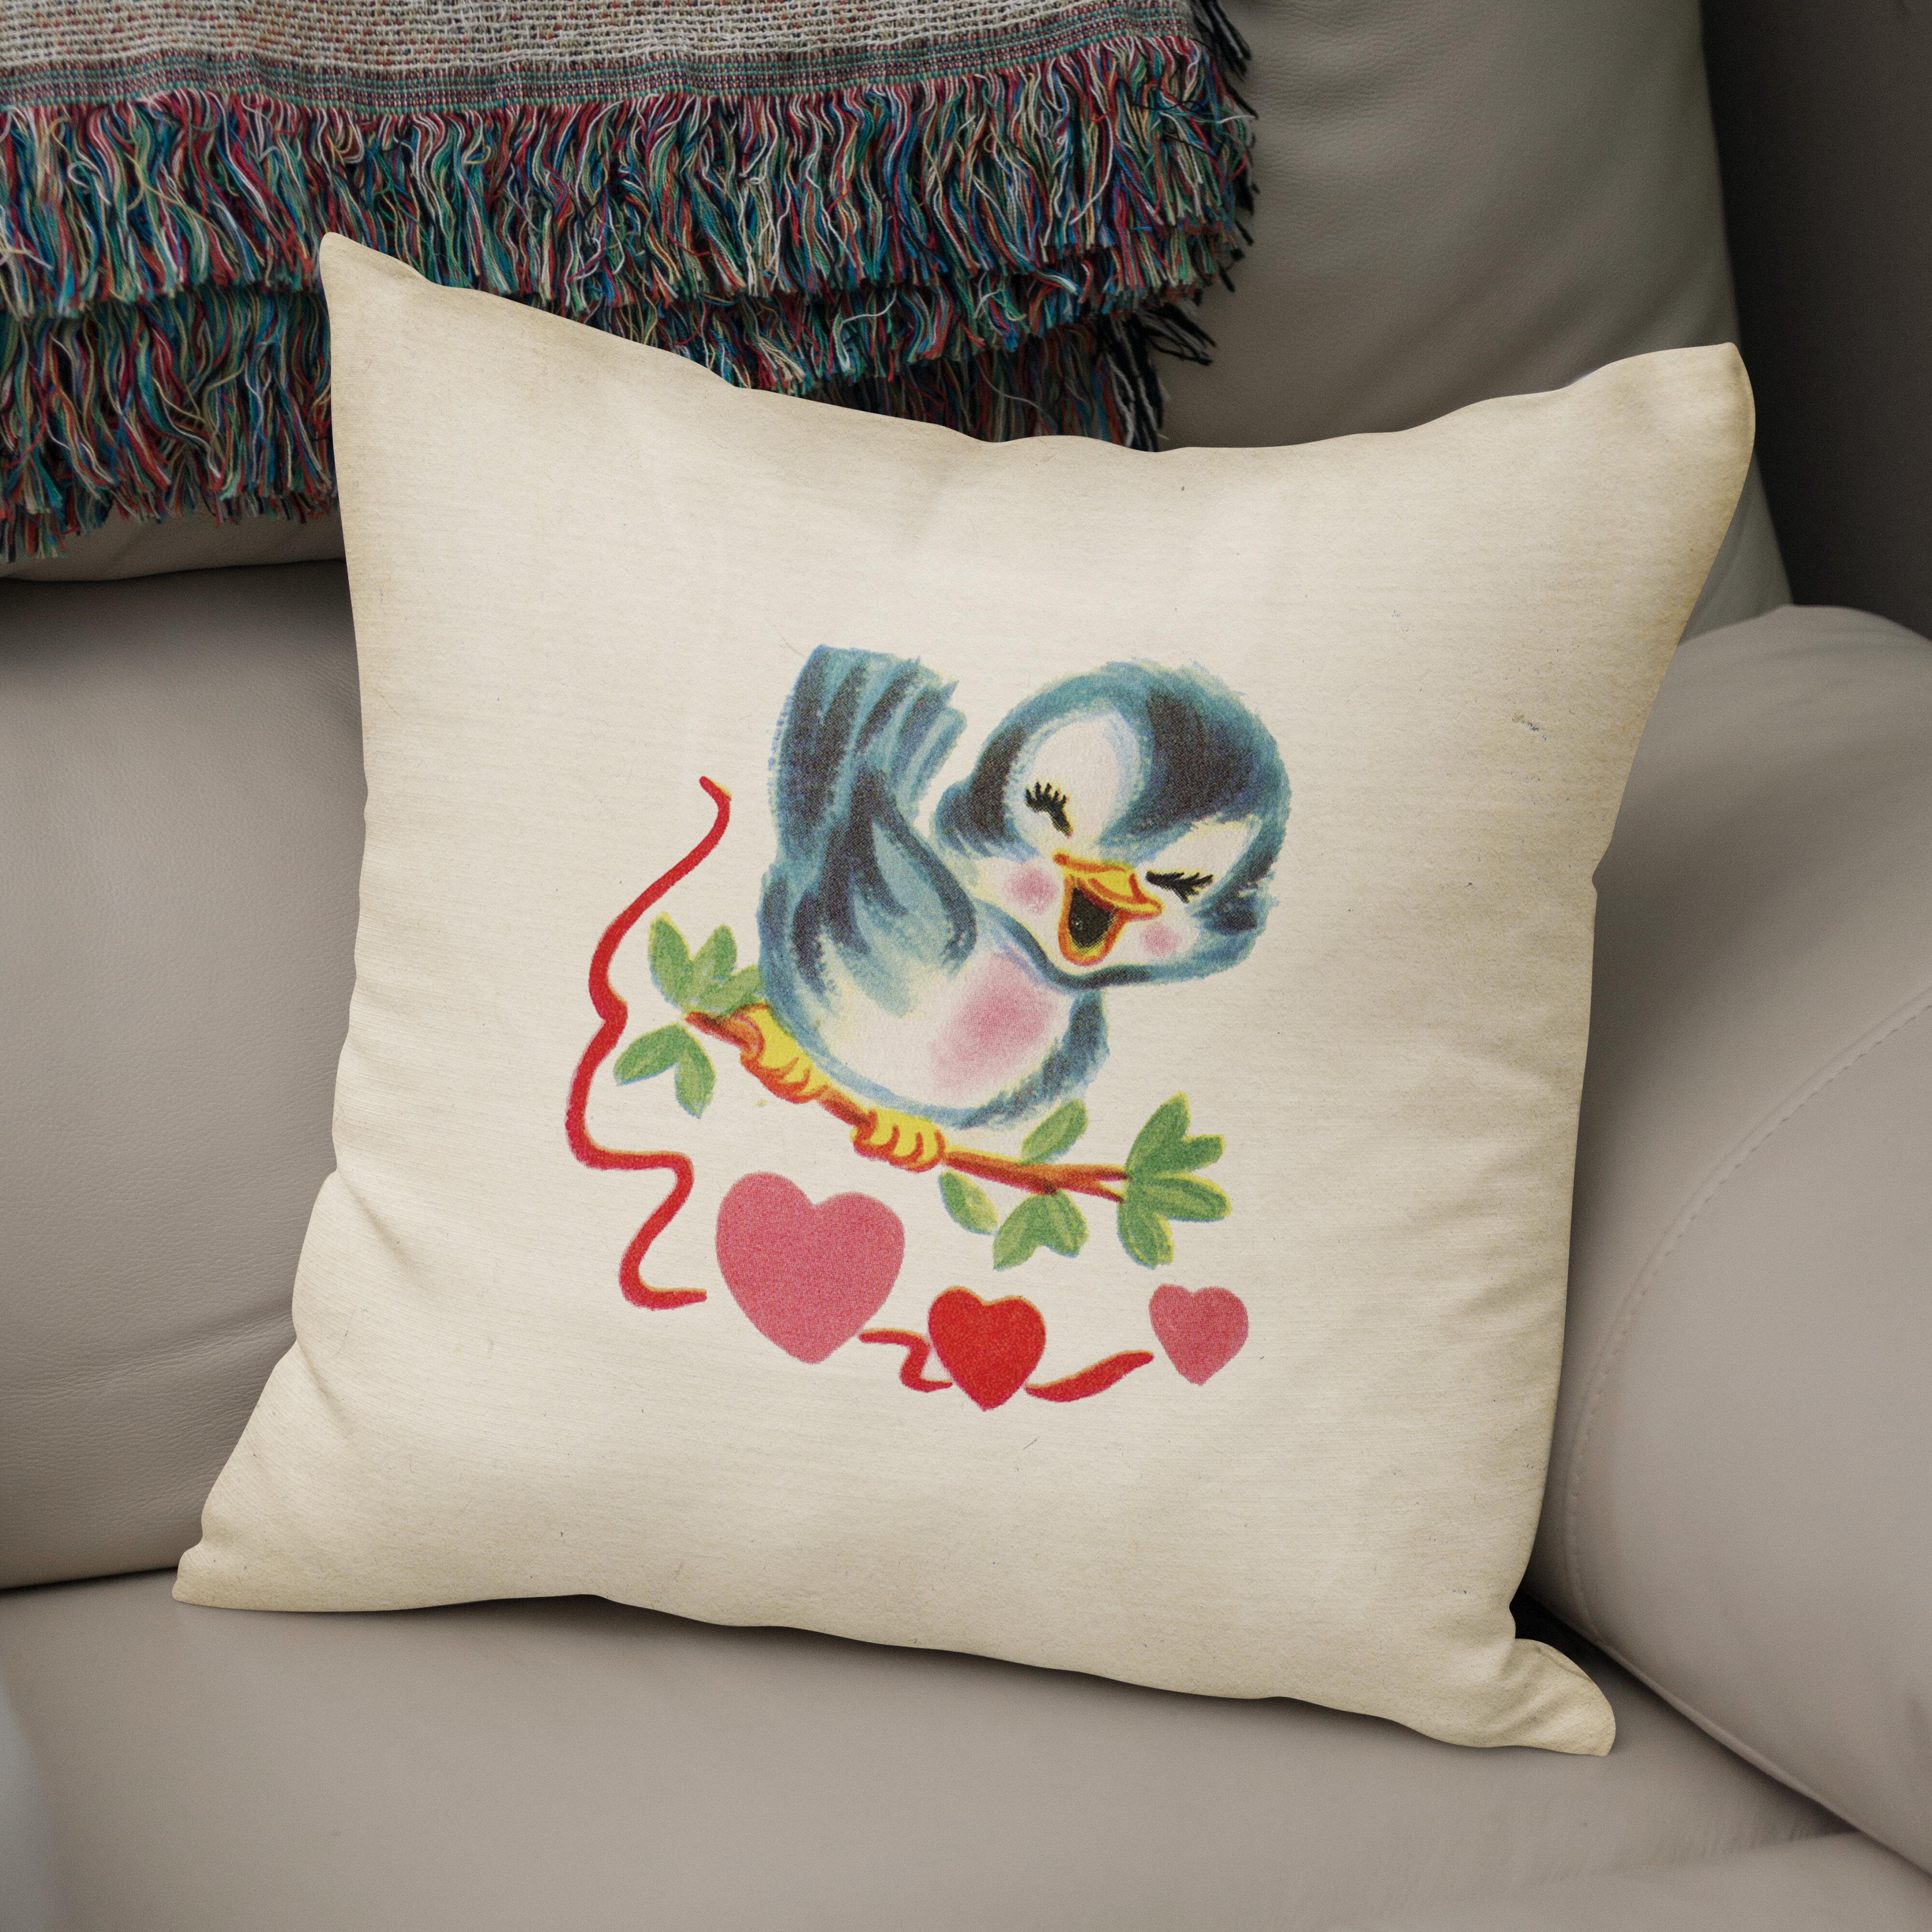 Animals Wildlife Kavka Designs Throw Pillows You Ll Love In 2021 Wayfair